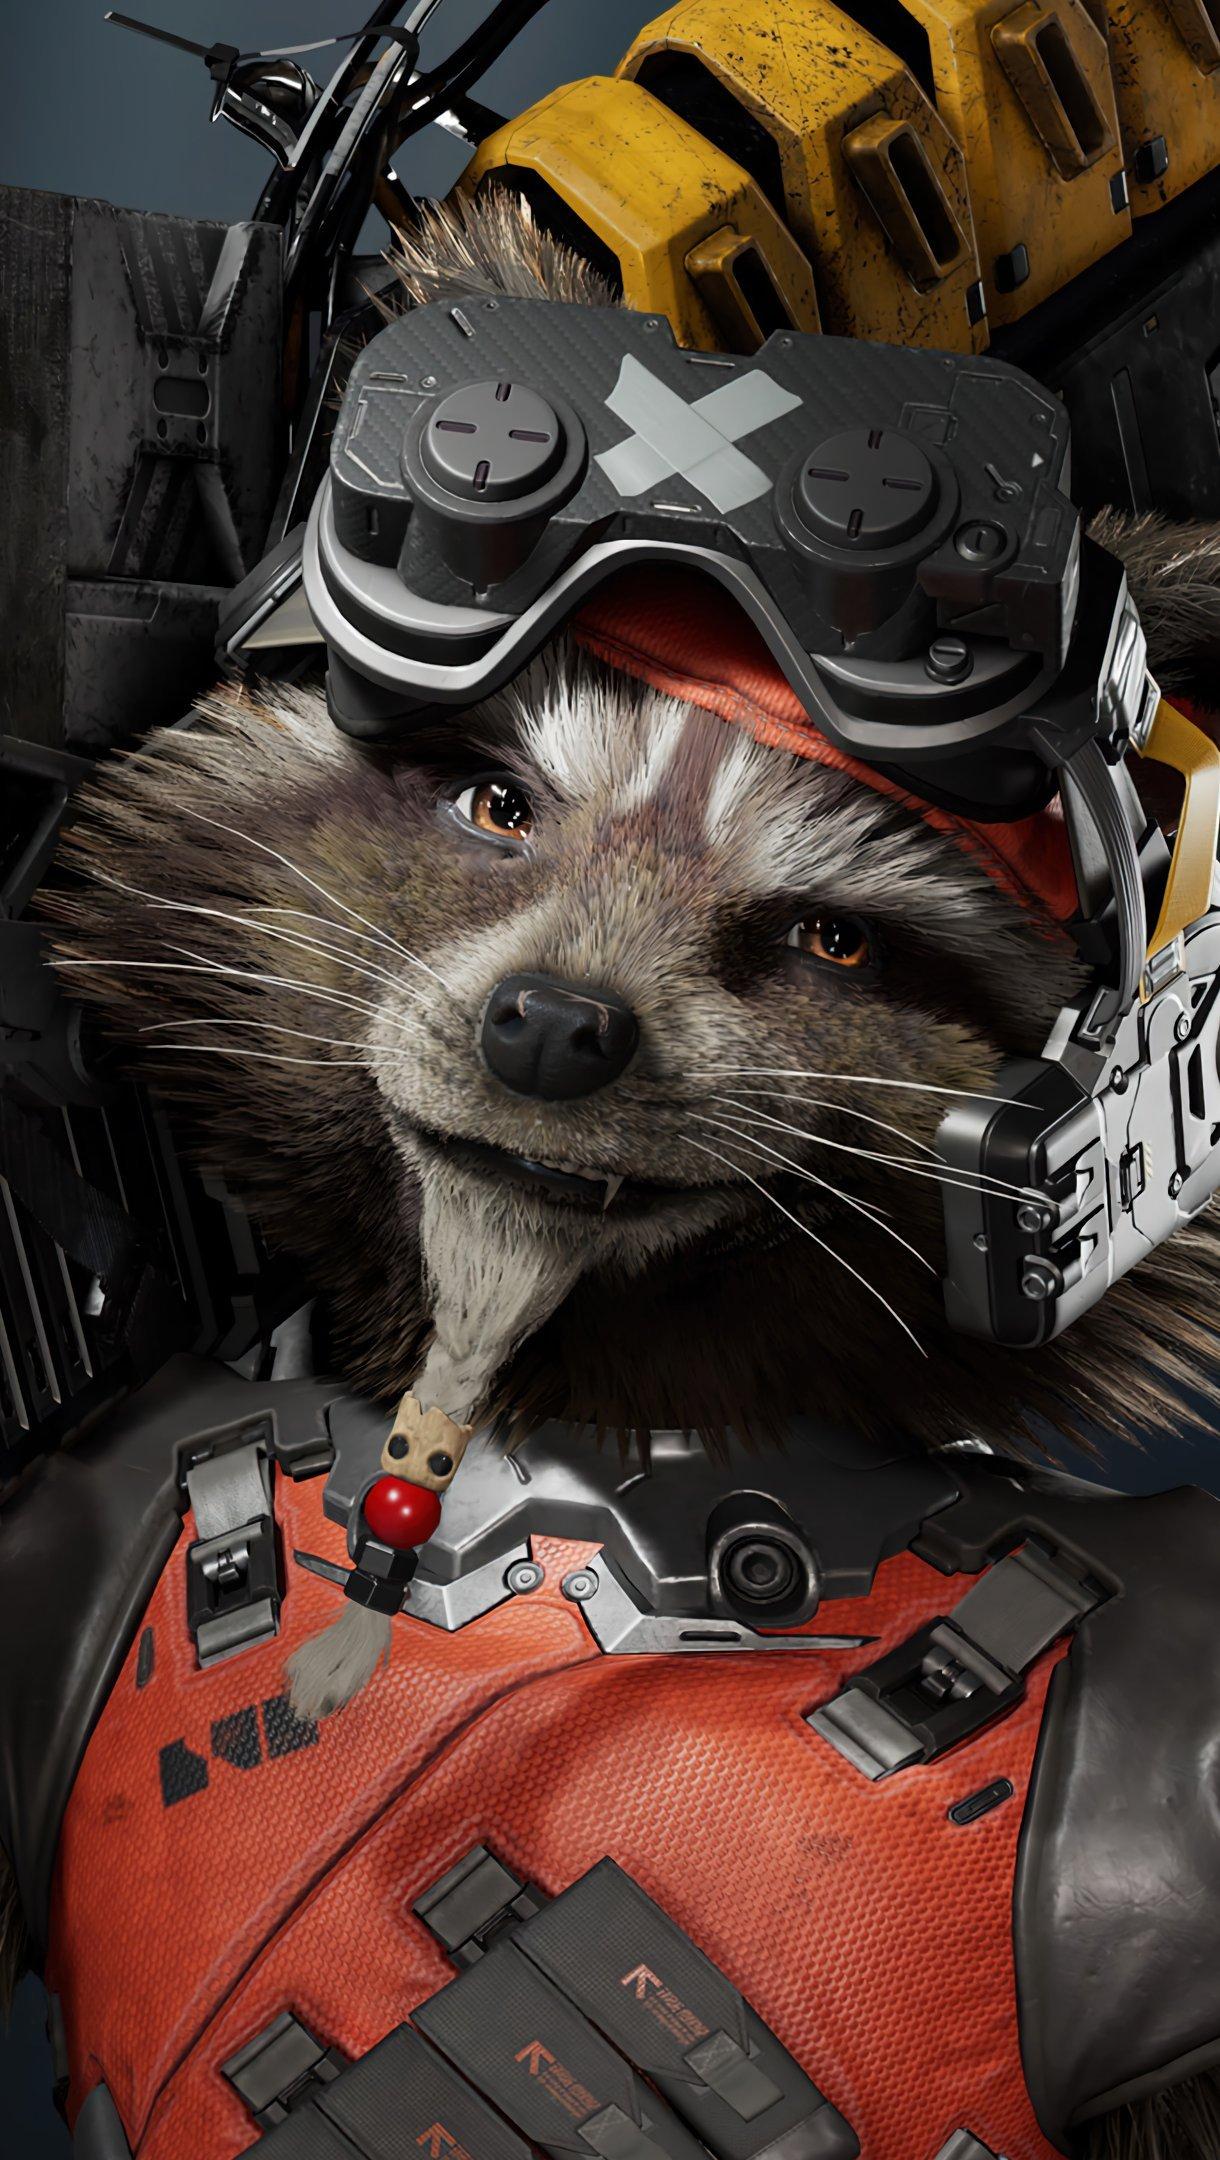 Wallpaper Rocket Raccoon Marvels Guardians of the galaxy Vertical